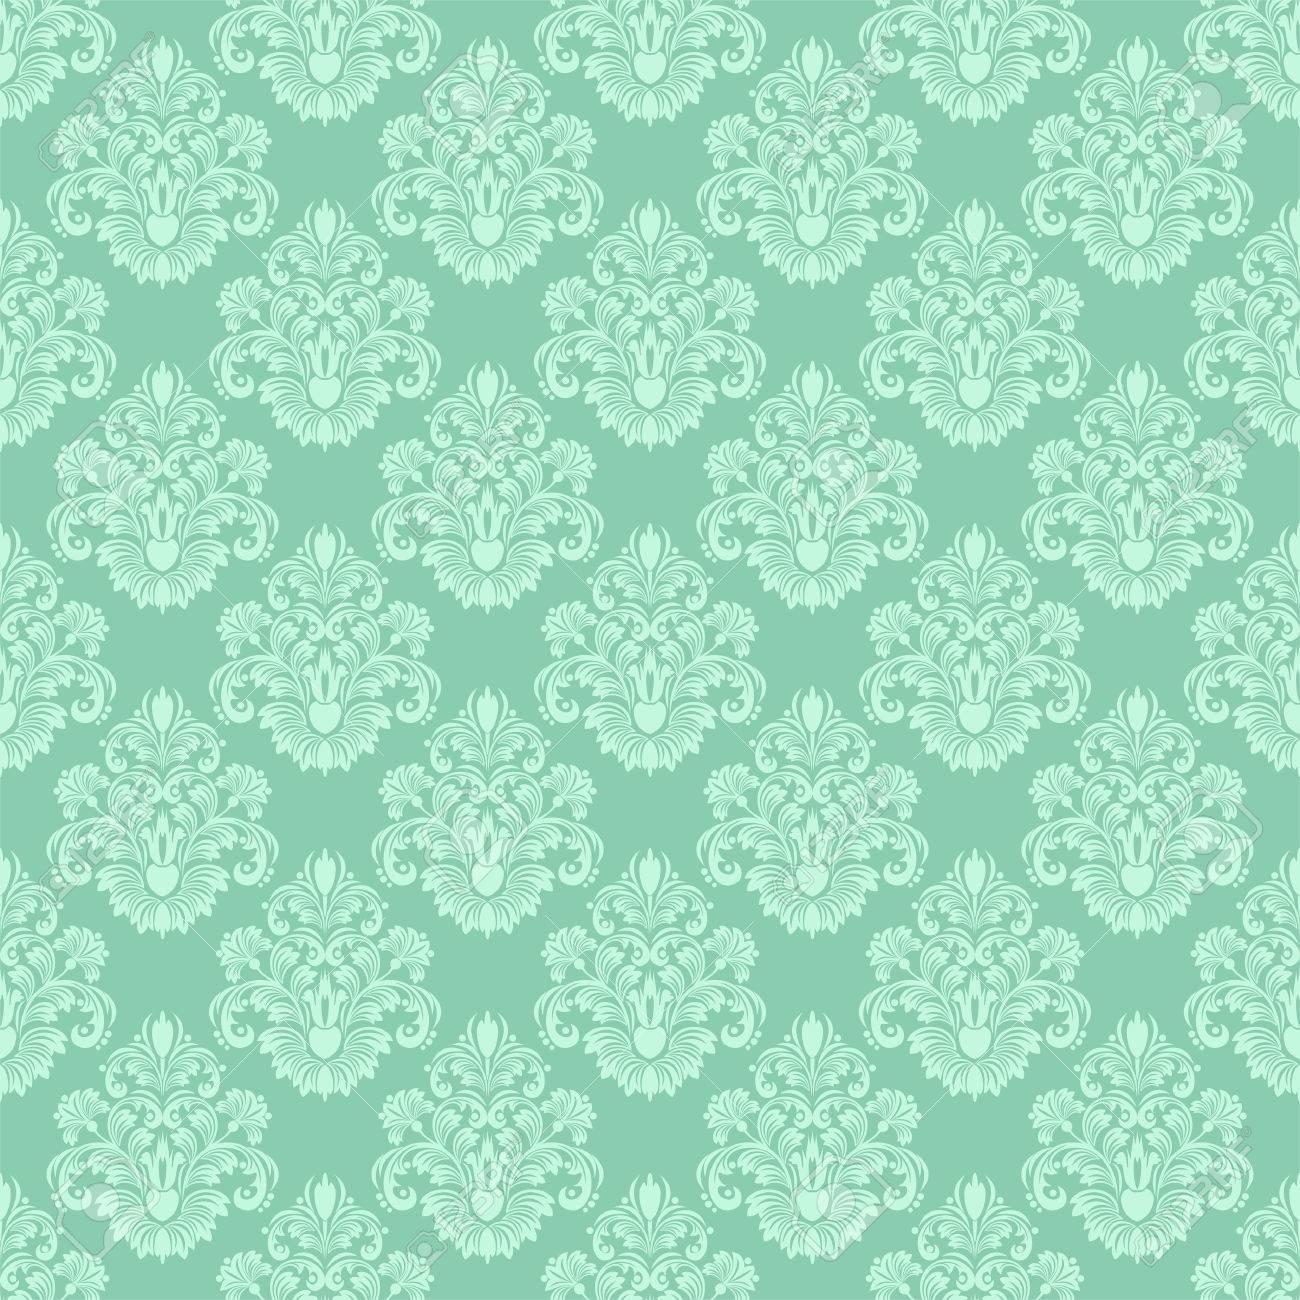 Damask seamless floral ornamental Wallpaper for design - 41658804